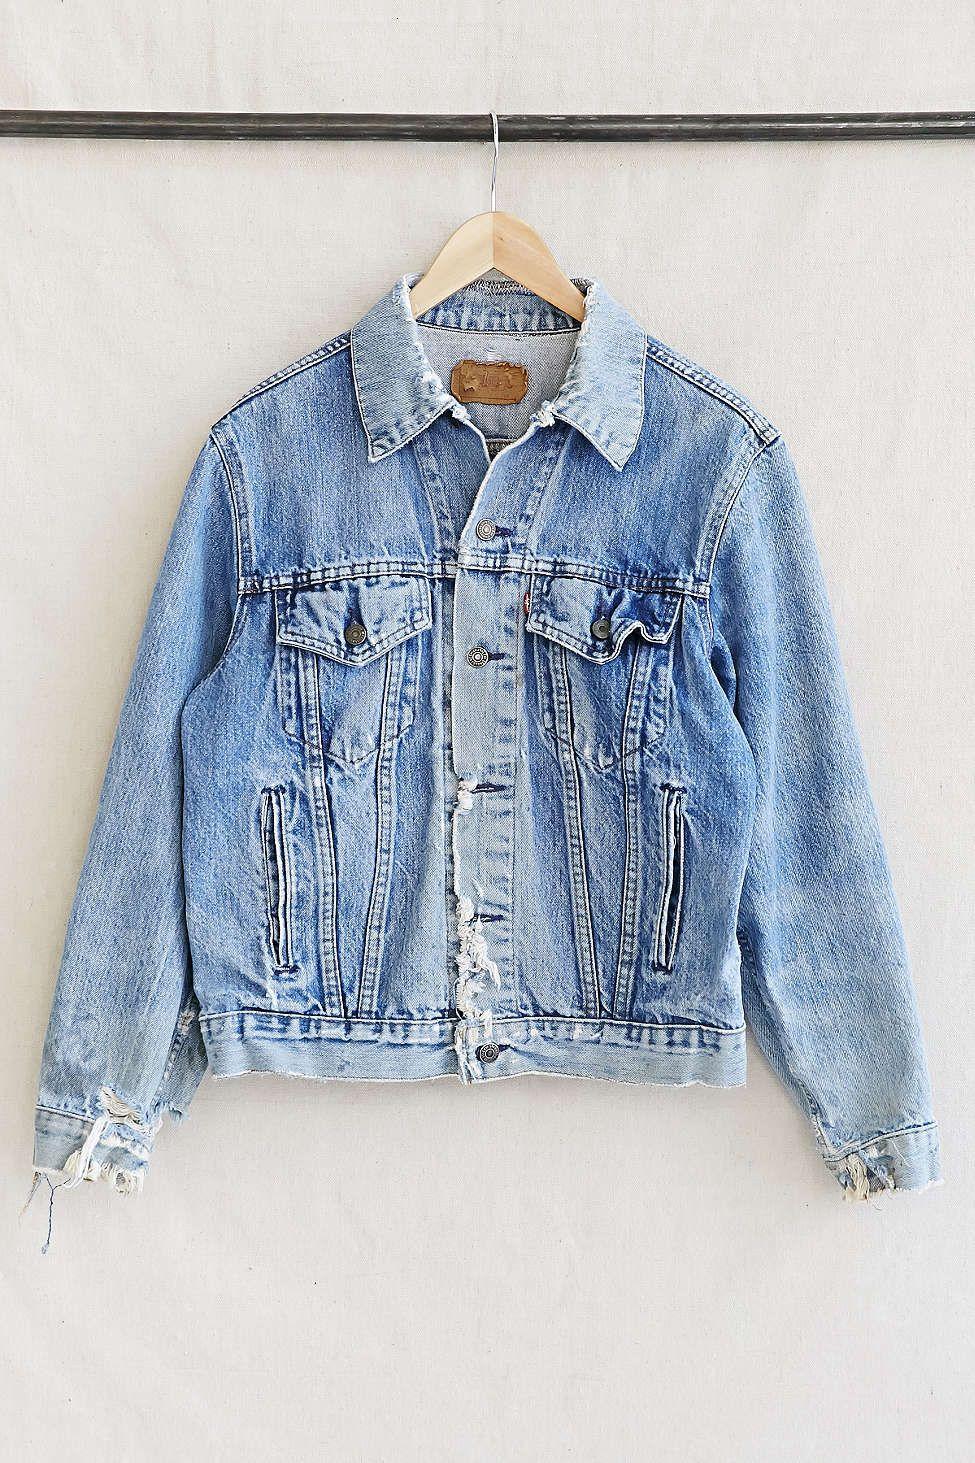 Vintage Levis Denim Jacket Uodenim Pinterest Jackets Skin Rip Off Stretch Soft Jeans Urban Outfitters